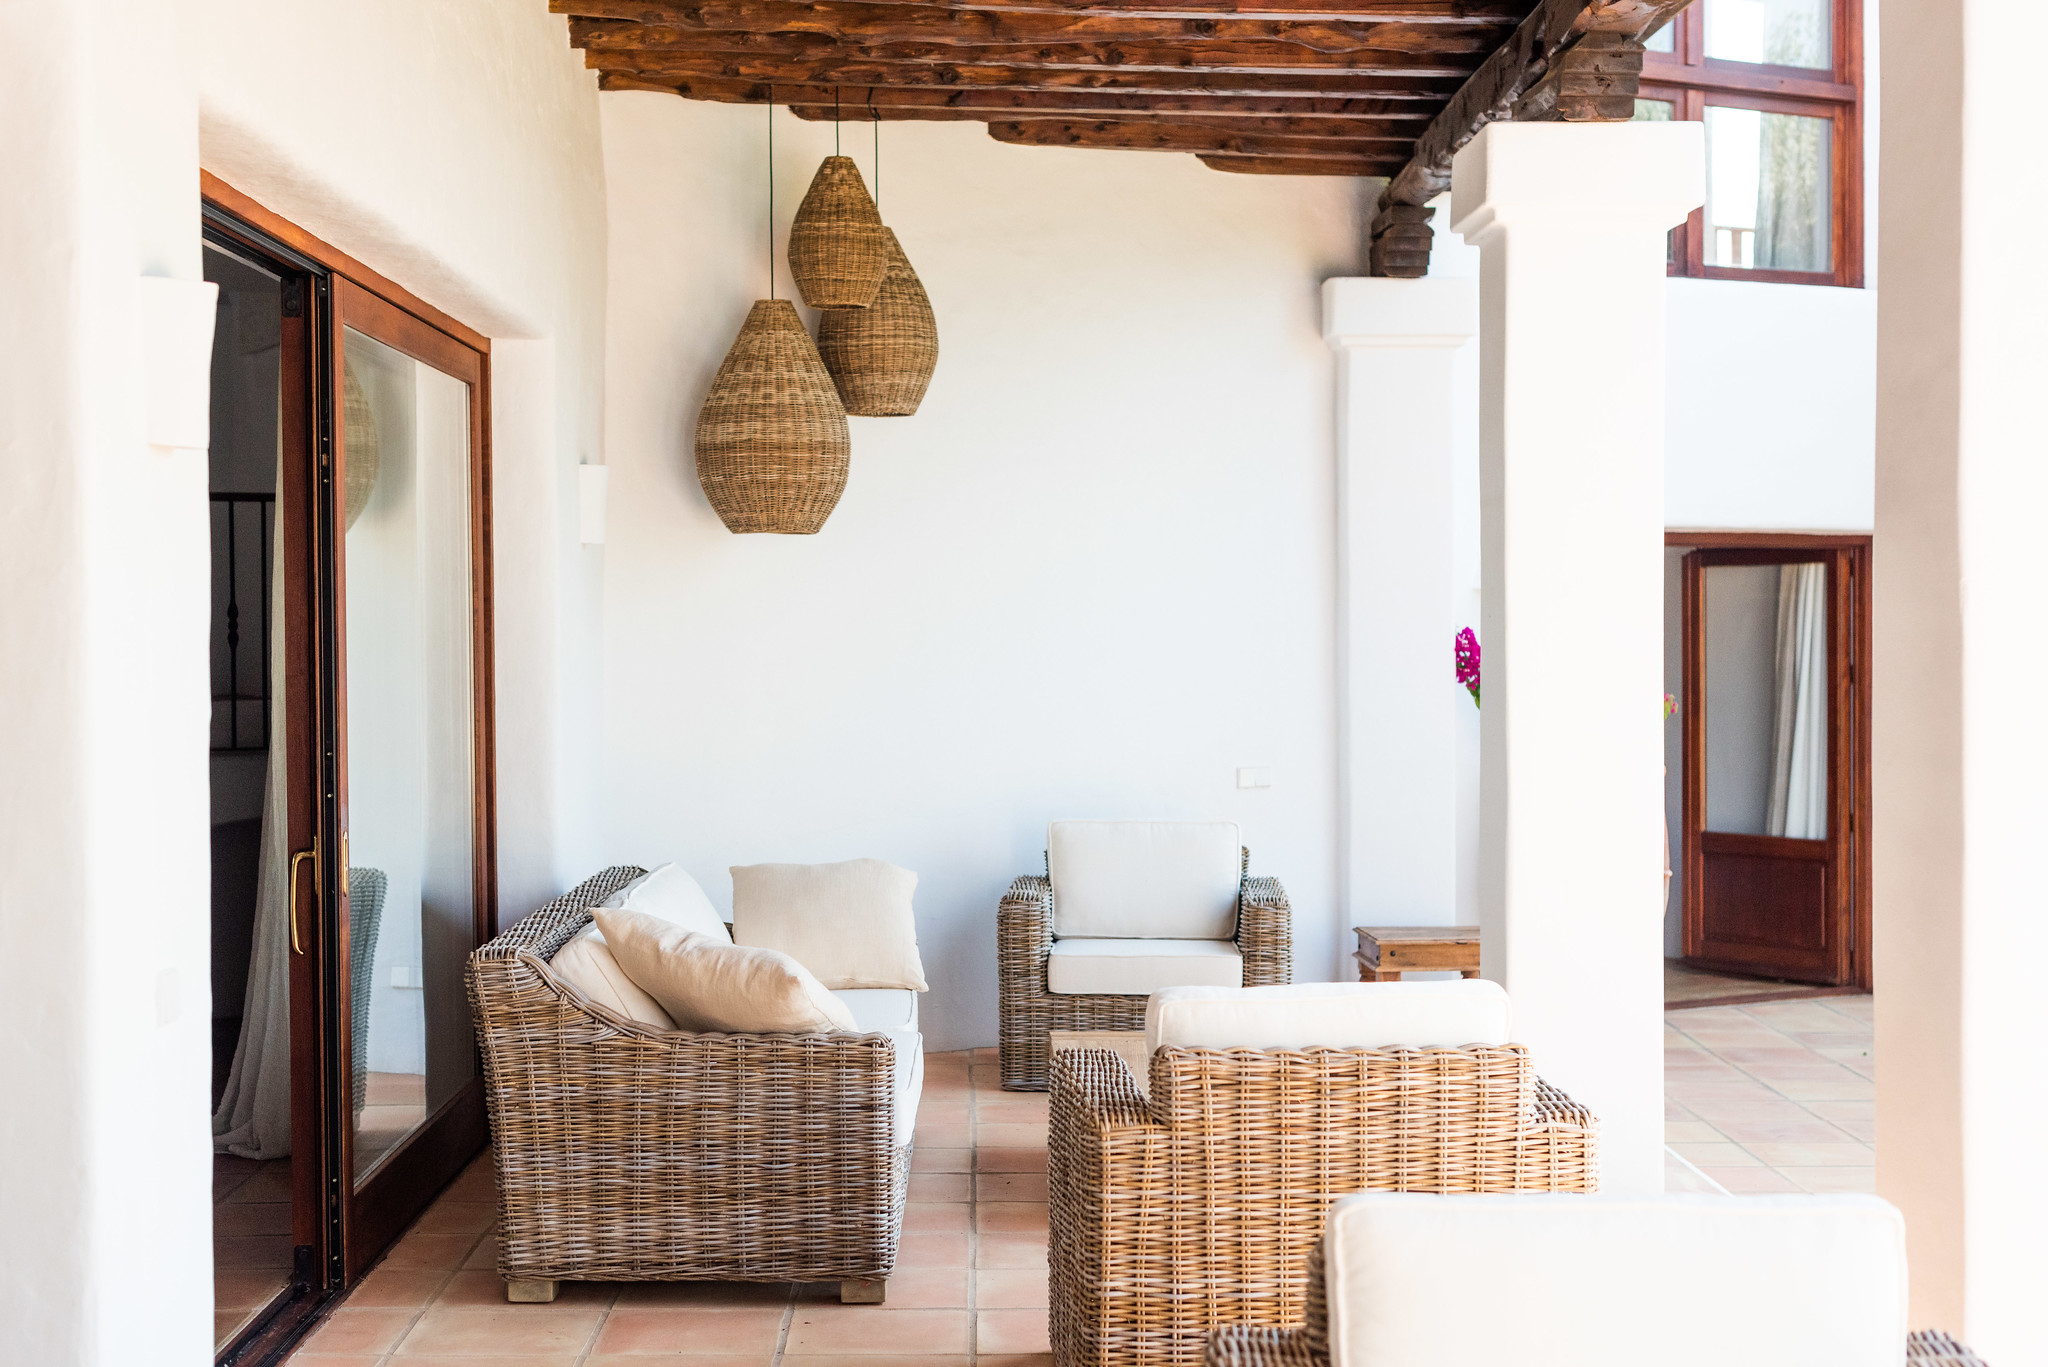 https://www.white-ibiza.com/wp-content/uploads/2020/05/white-ibiza-villas-can-lavanda-.jpg